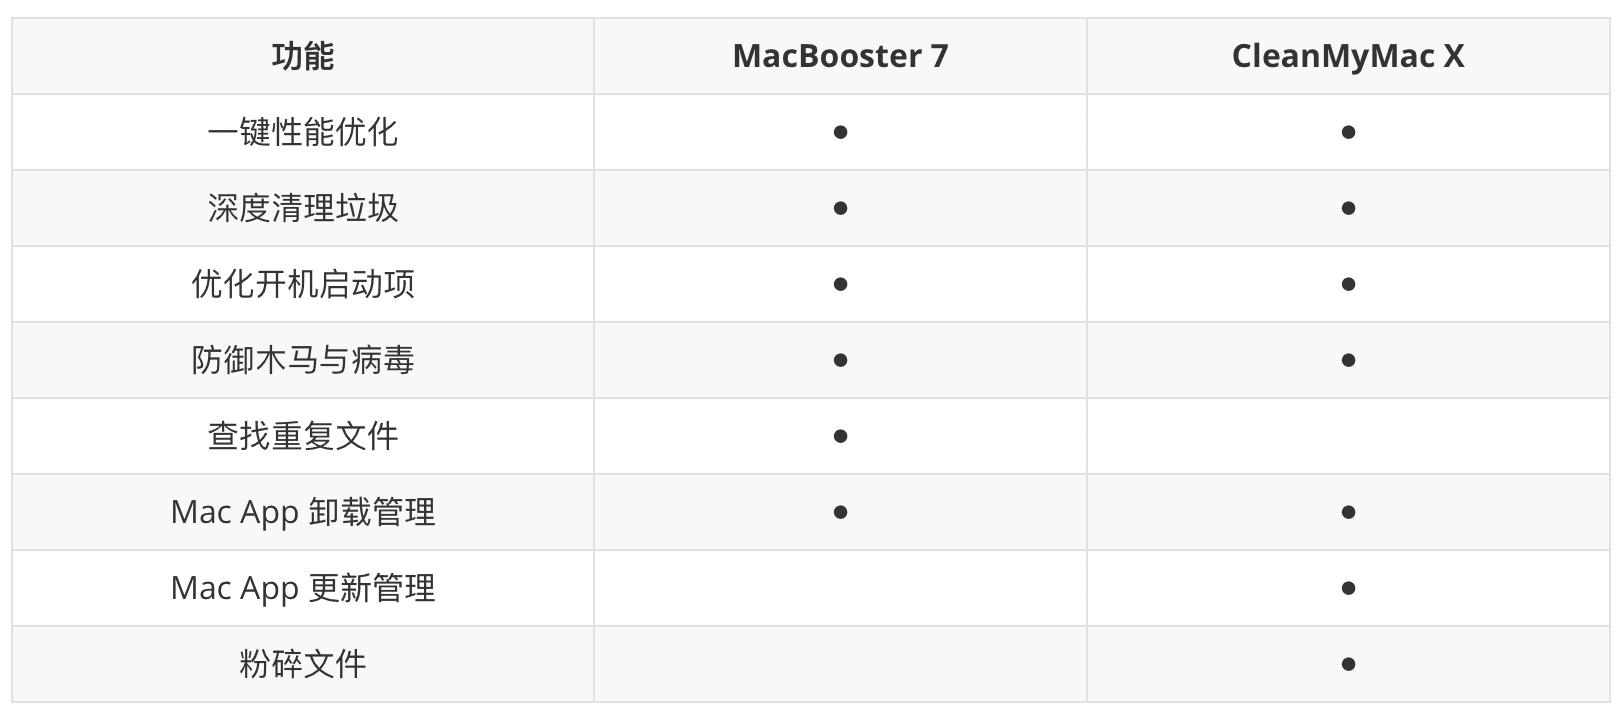 Mac 清理优化工具 MacBooster 限时特惠,终生版6折最低仅需 59 元-沙唐桔